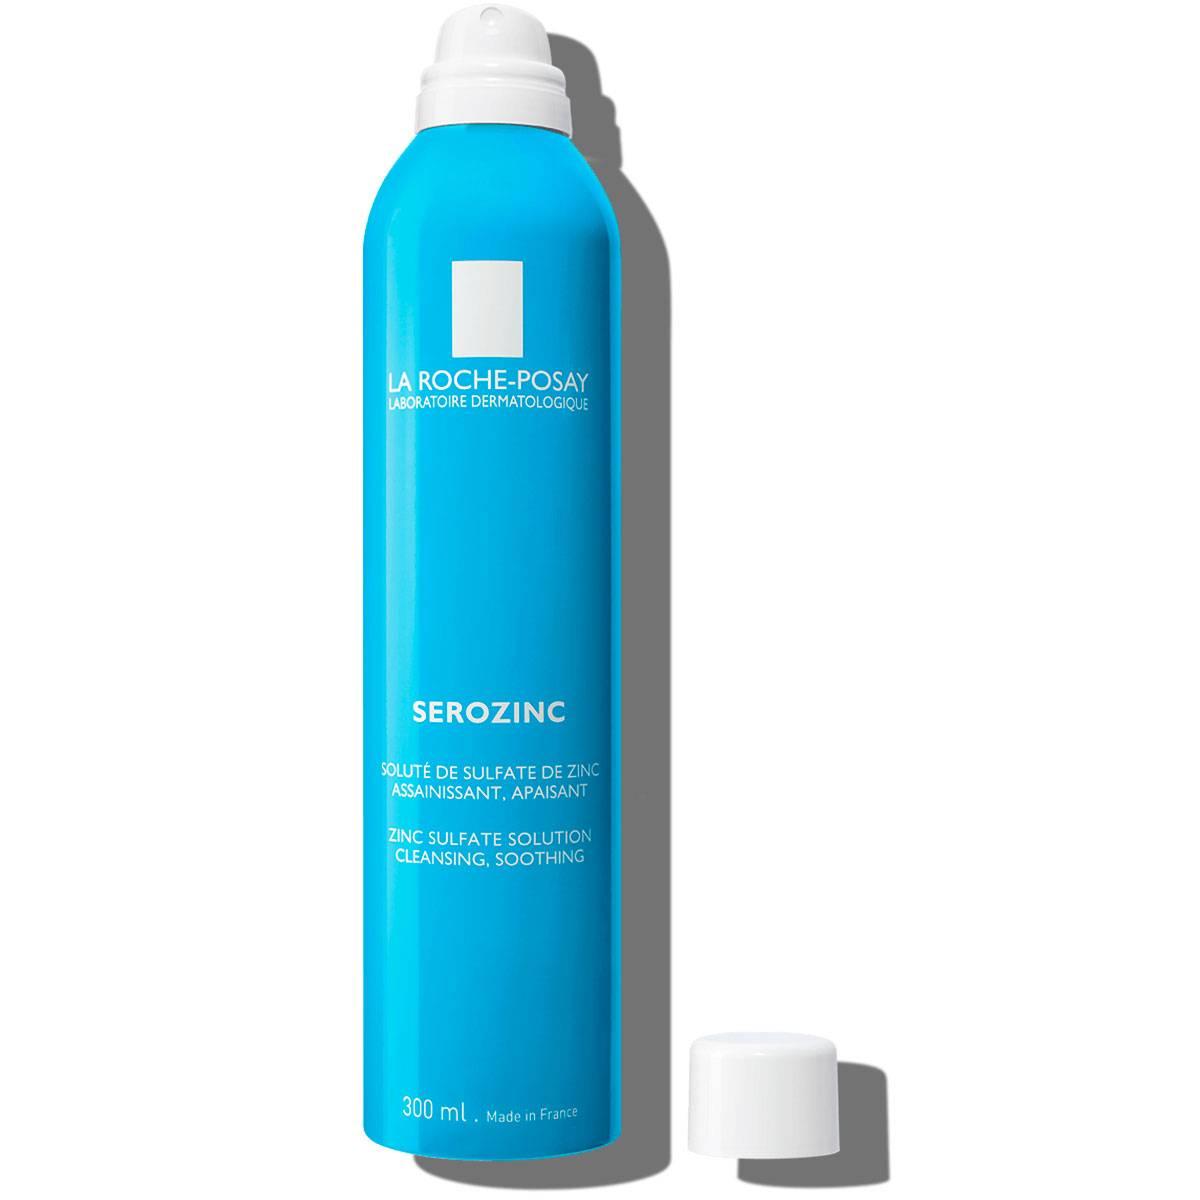 La Roche Posay ProductPage Serozinc Spray Zinc 300ml 3337875565783 Ope